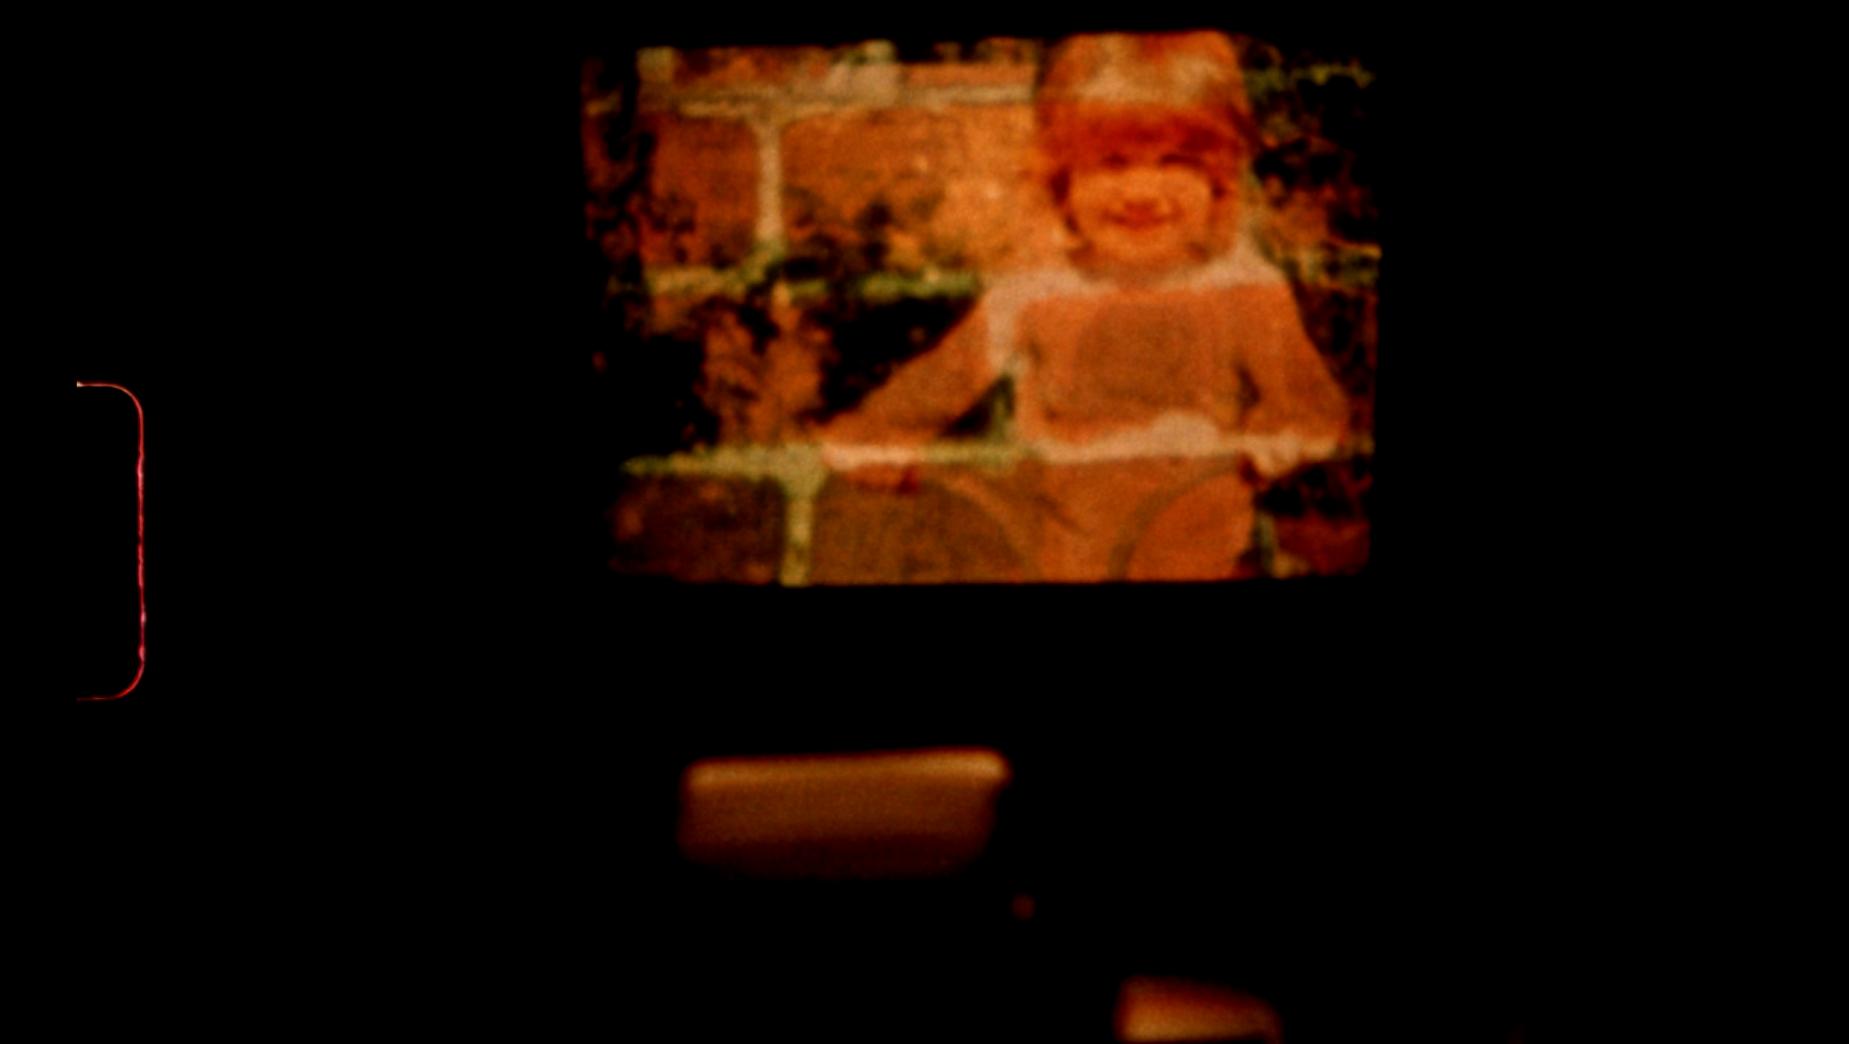 Super 8mm film footage, Imprint